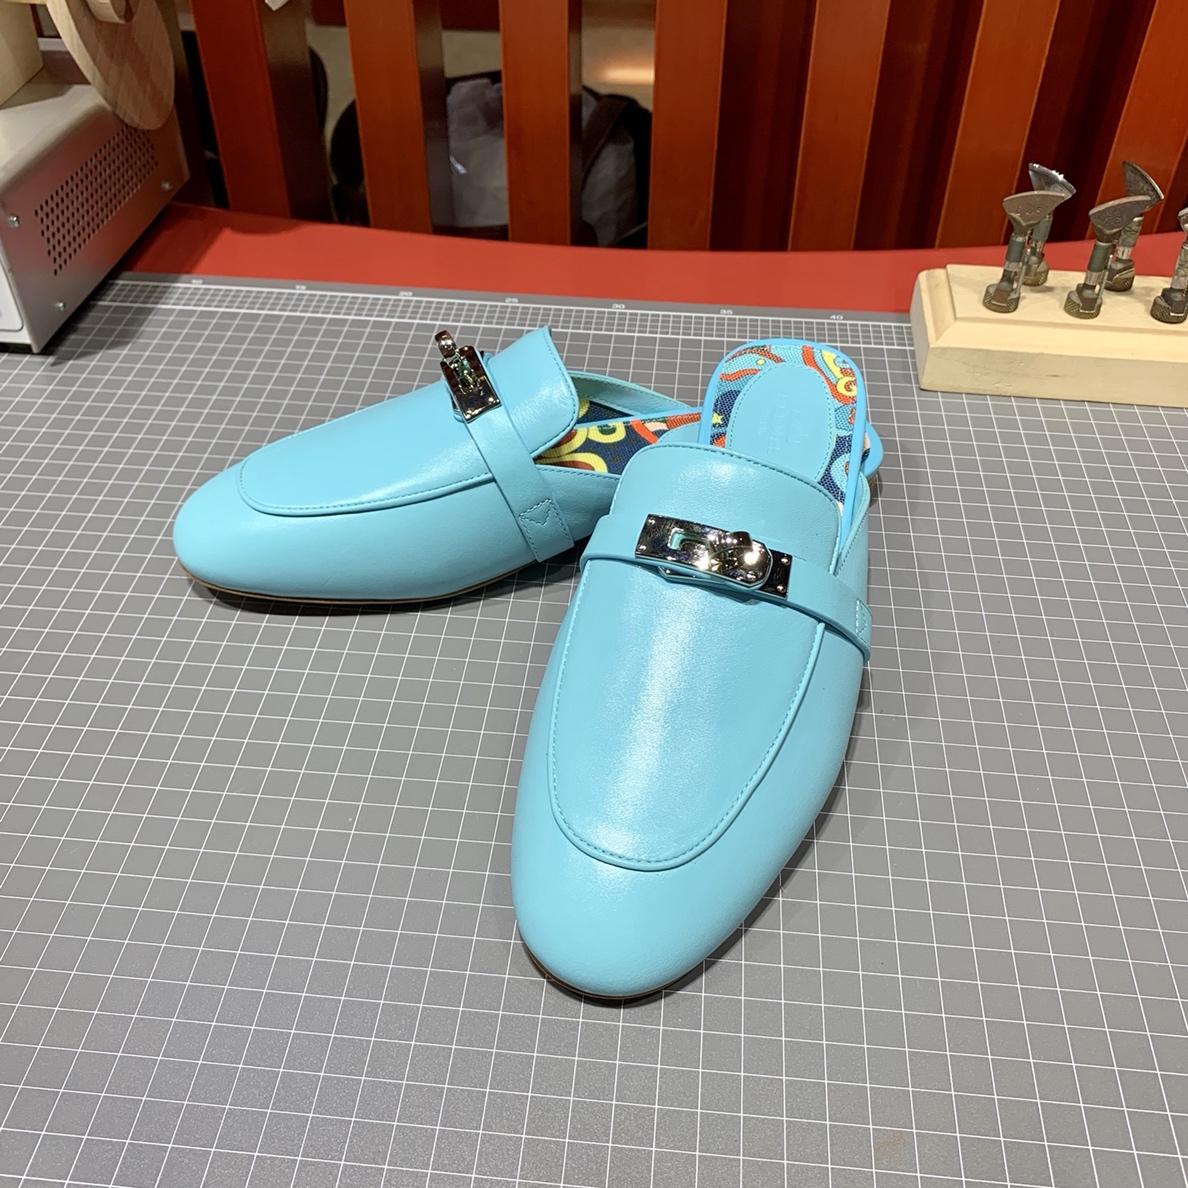 Hermes拖鞋批发 爱马仕原厂Swift牛皮OZ mule穆勒鞋凯莉拖鞋 马卡龙蓝